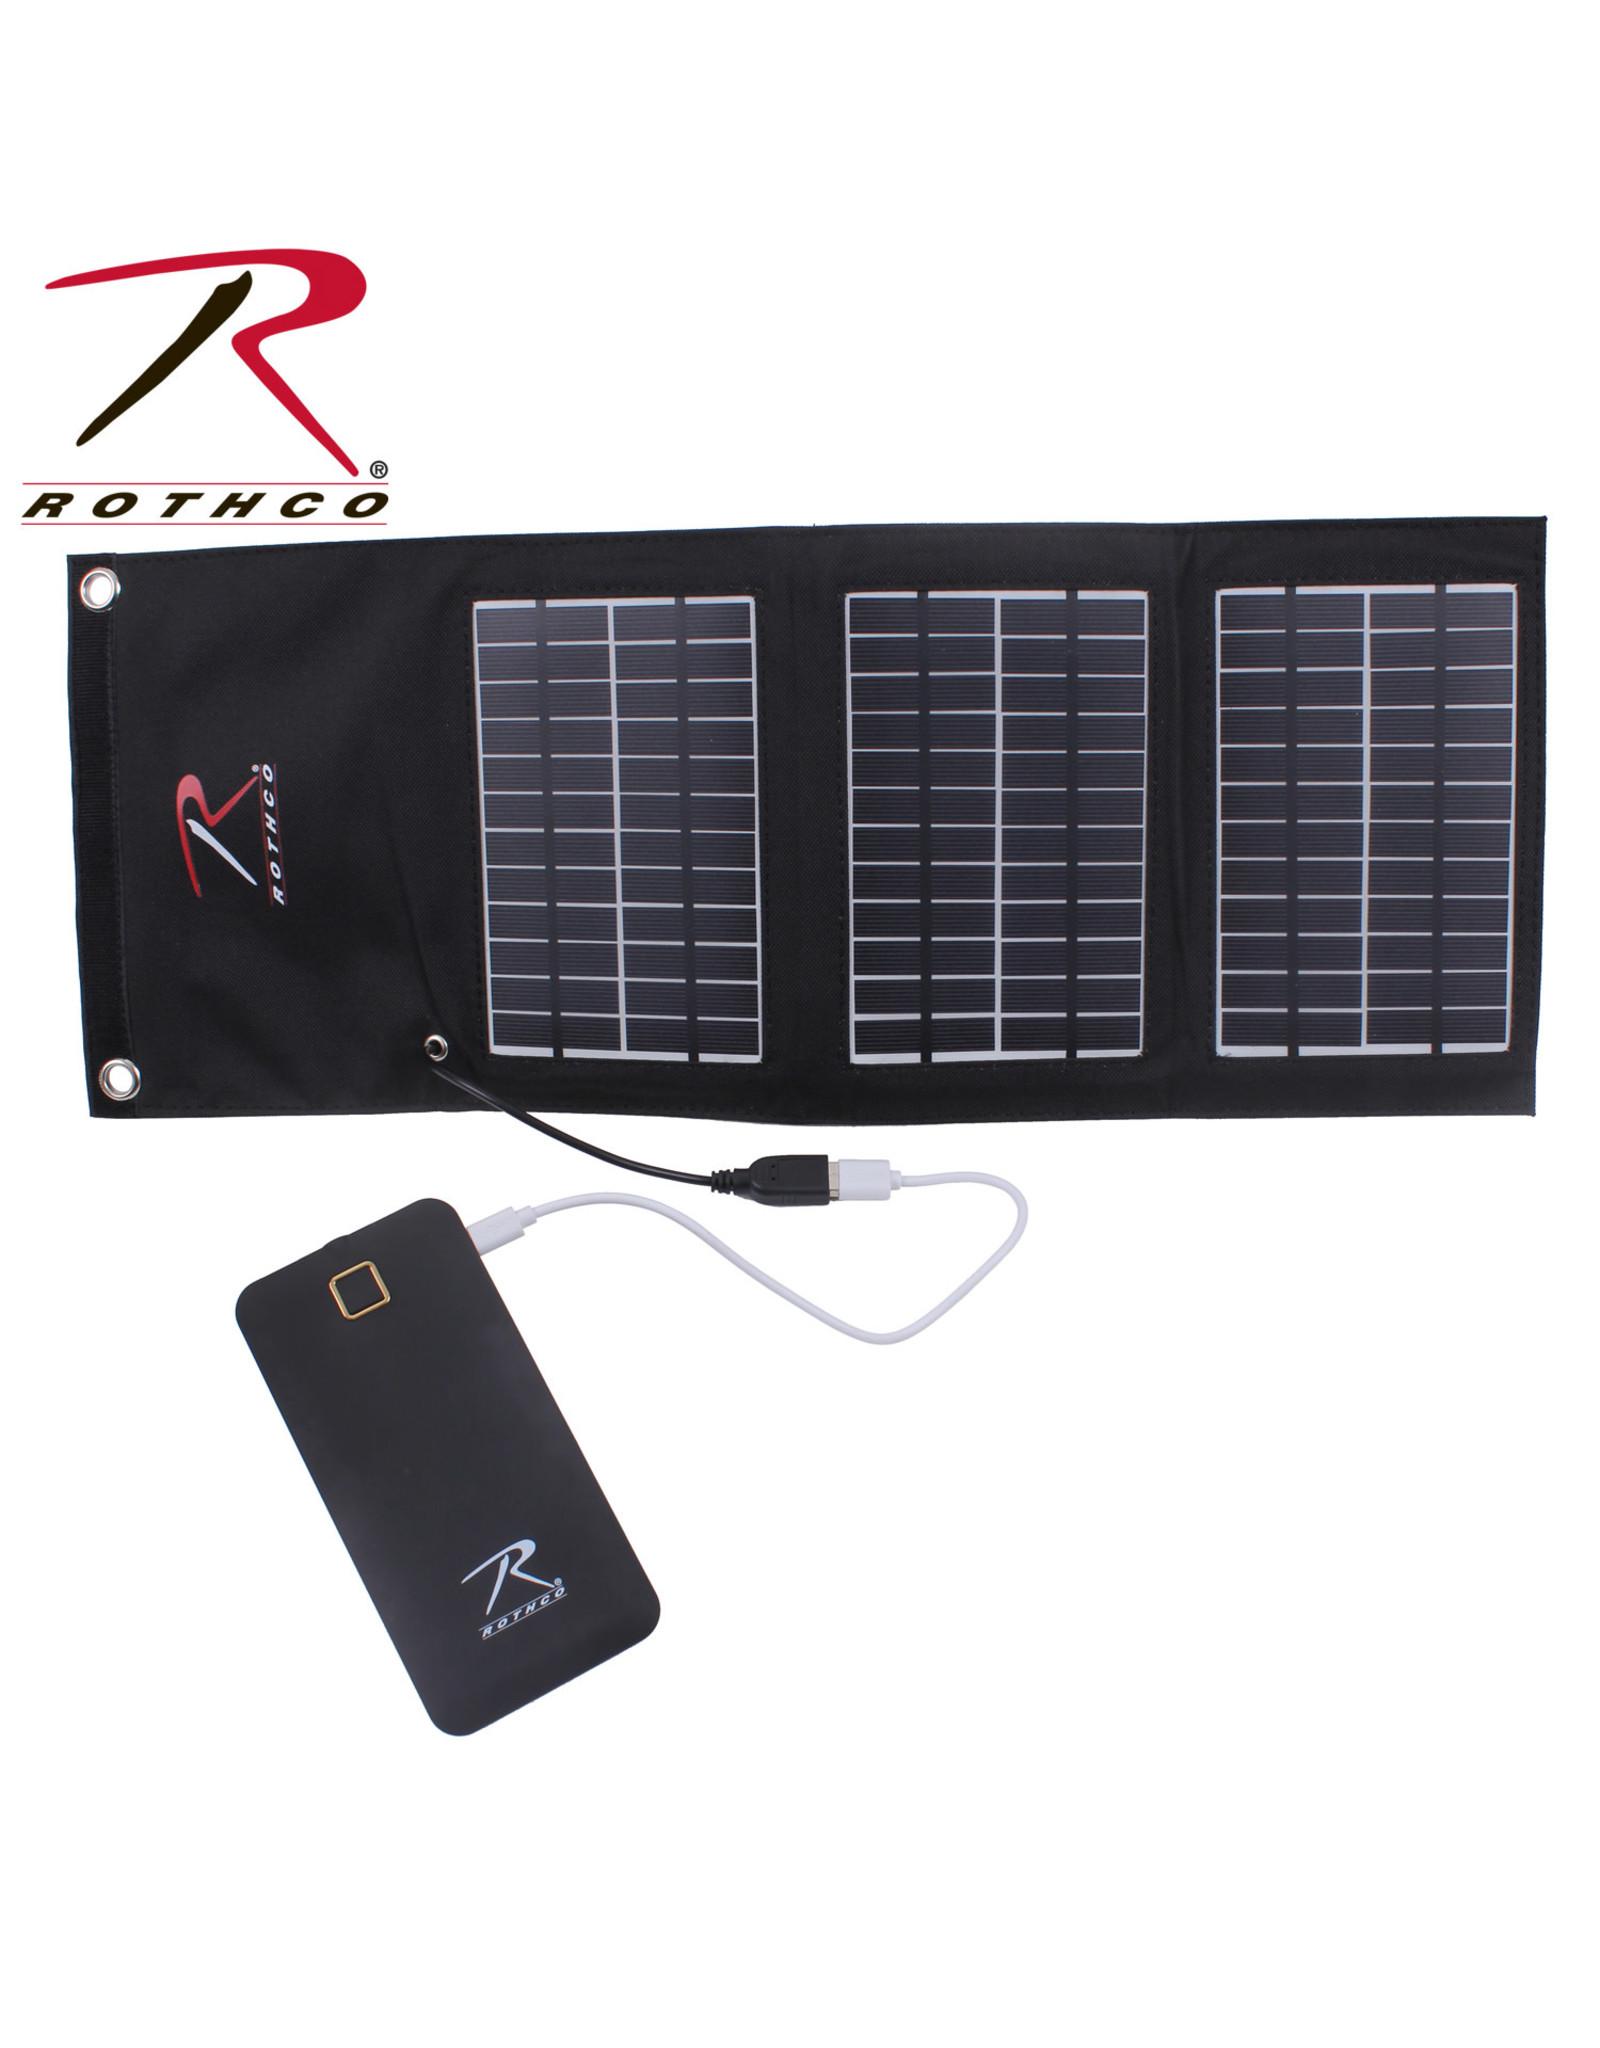 Rothco M/A Folding Solar Panel and Powerbank